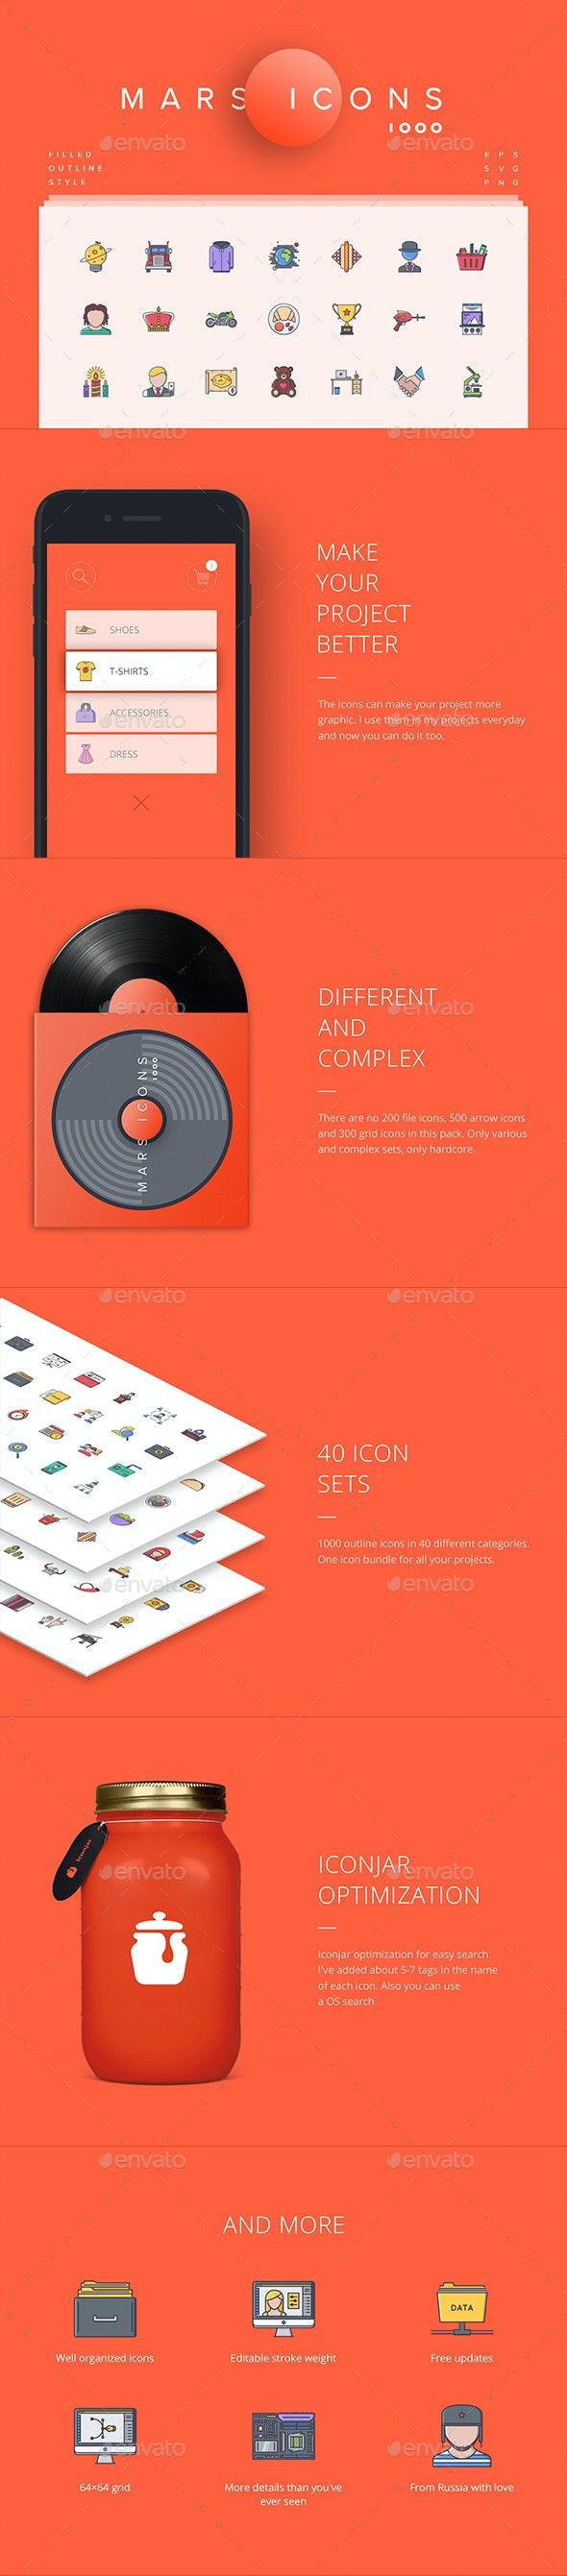 Mars Icons - Icons